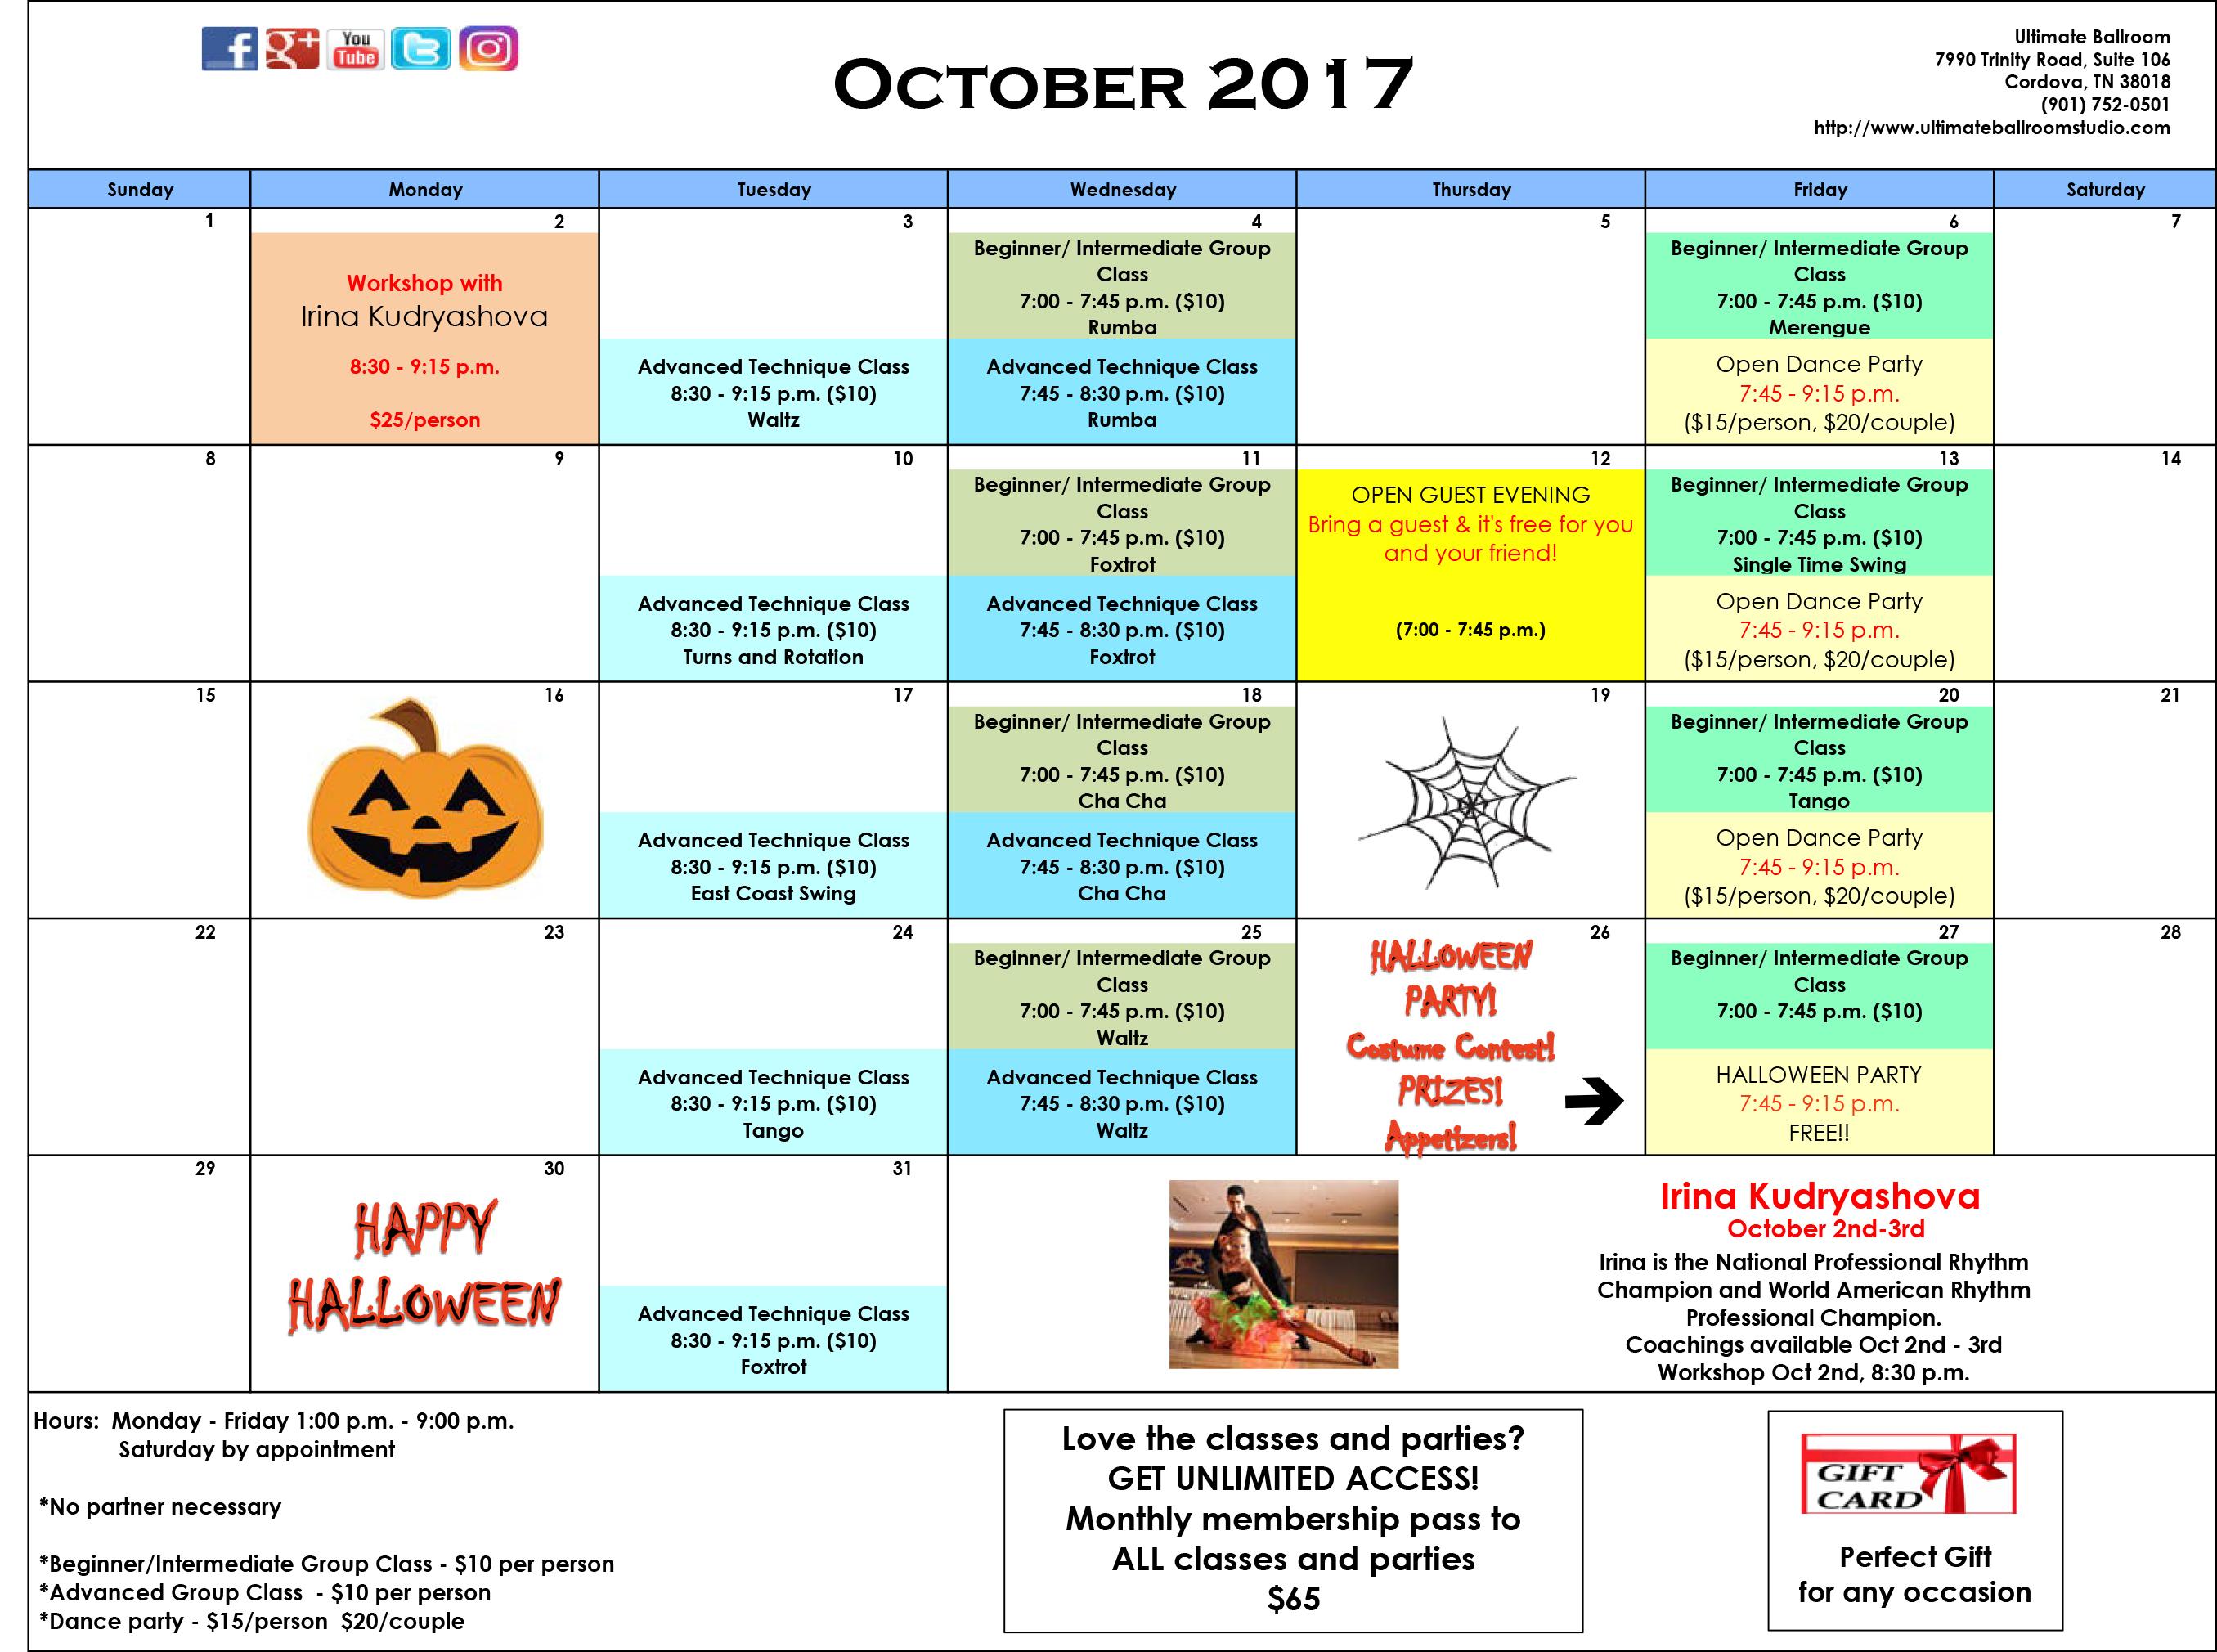 Events Calendar - October 2017 - Ultimate Ballroom